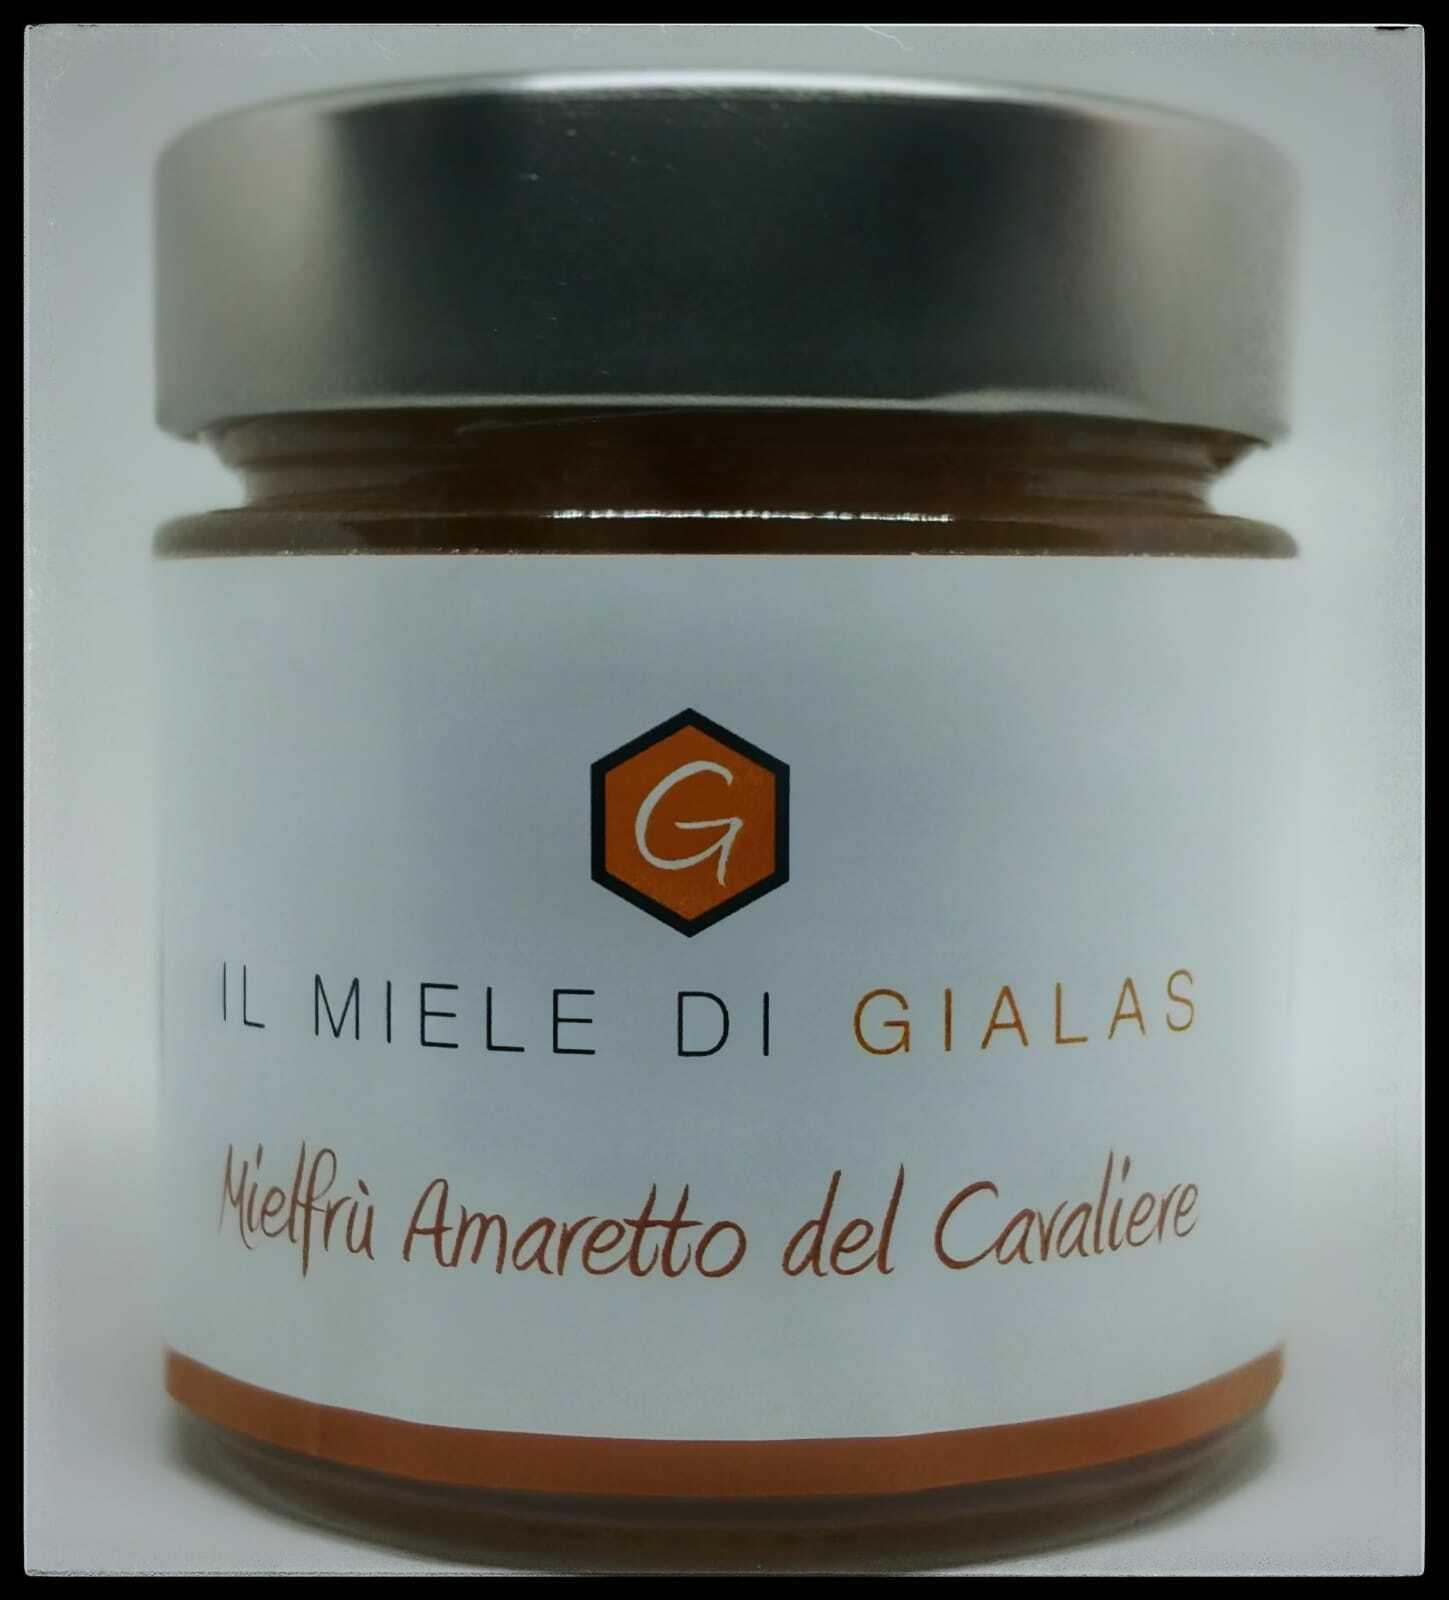 Mielfrù Amaretto del Cavaliere 00076